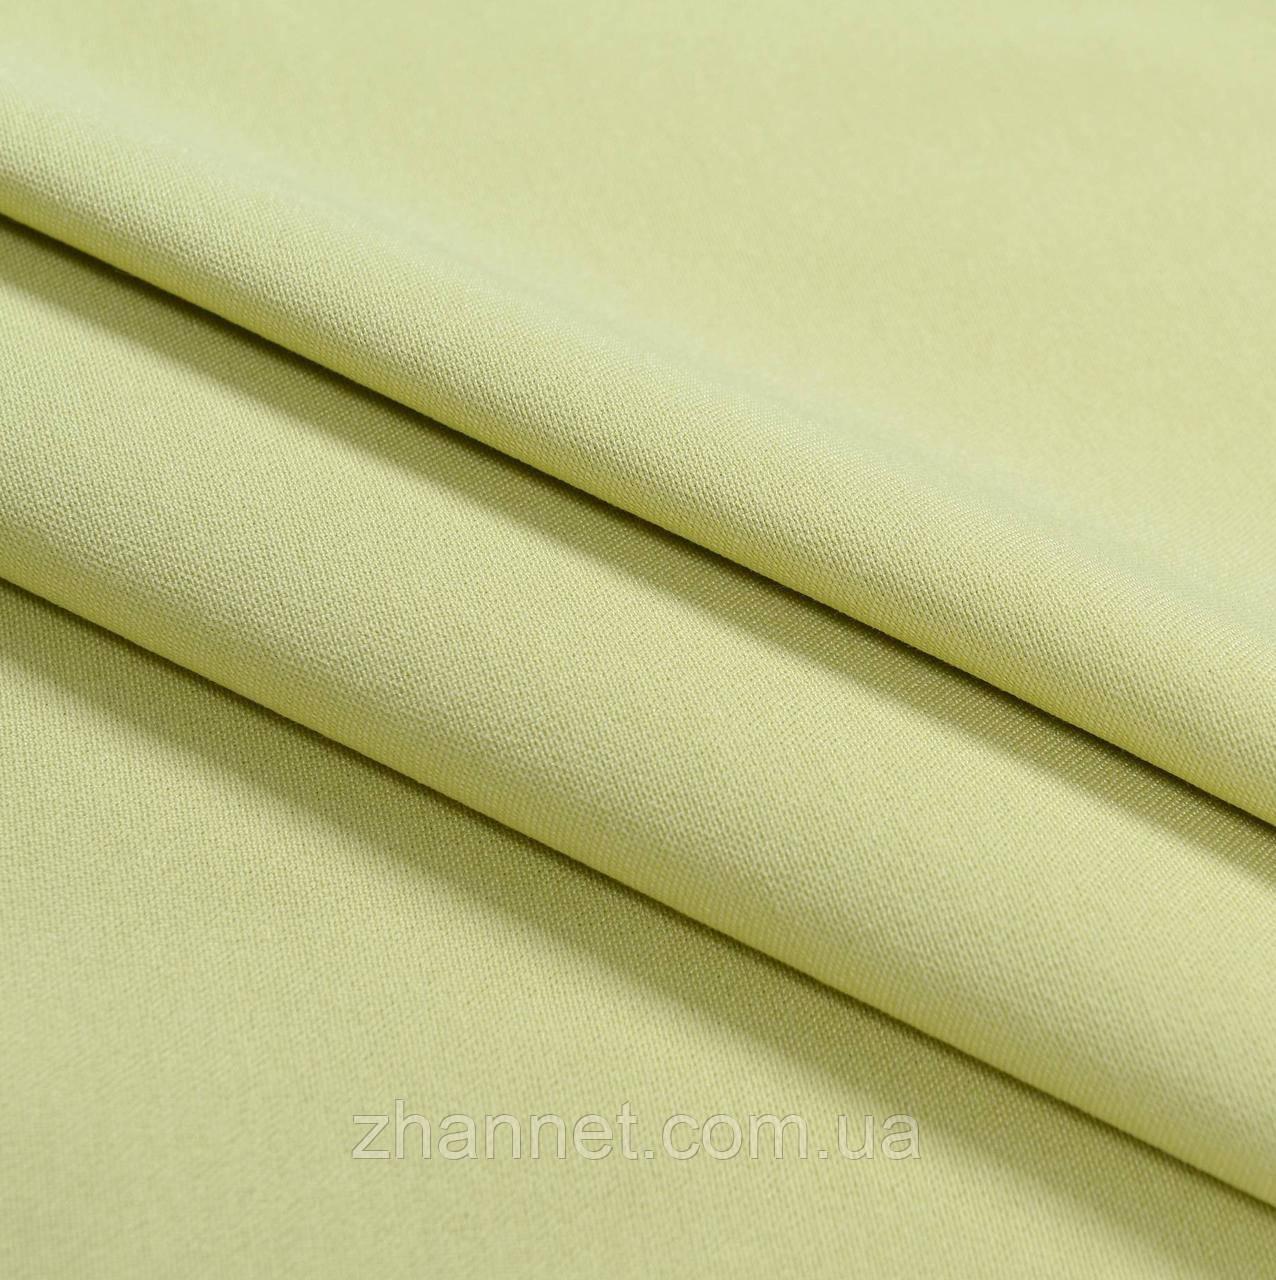 Ткань для штор Kanzas зеленый чай